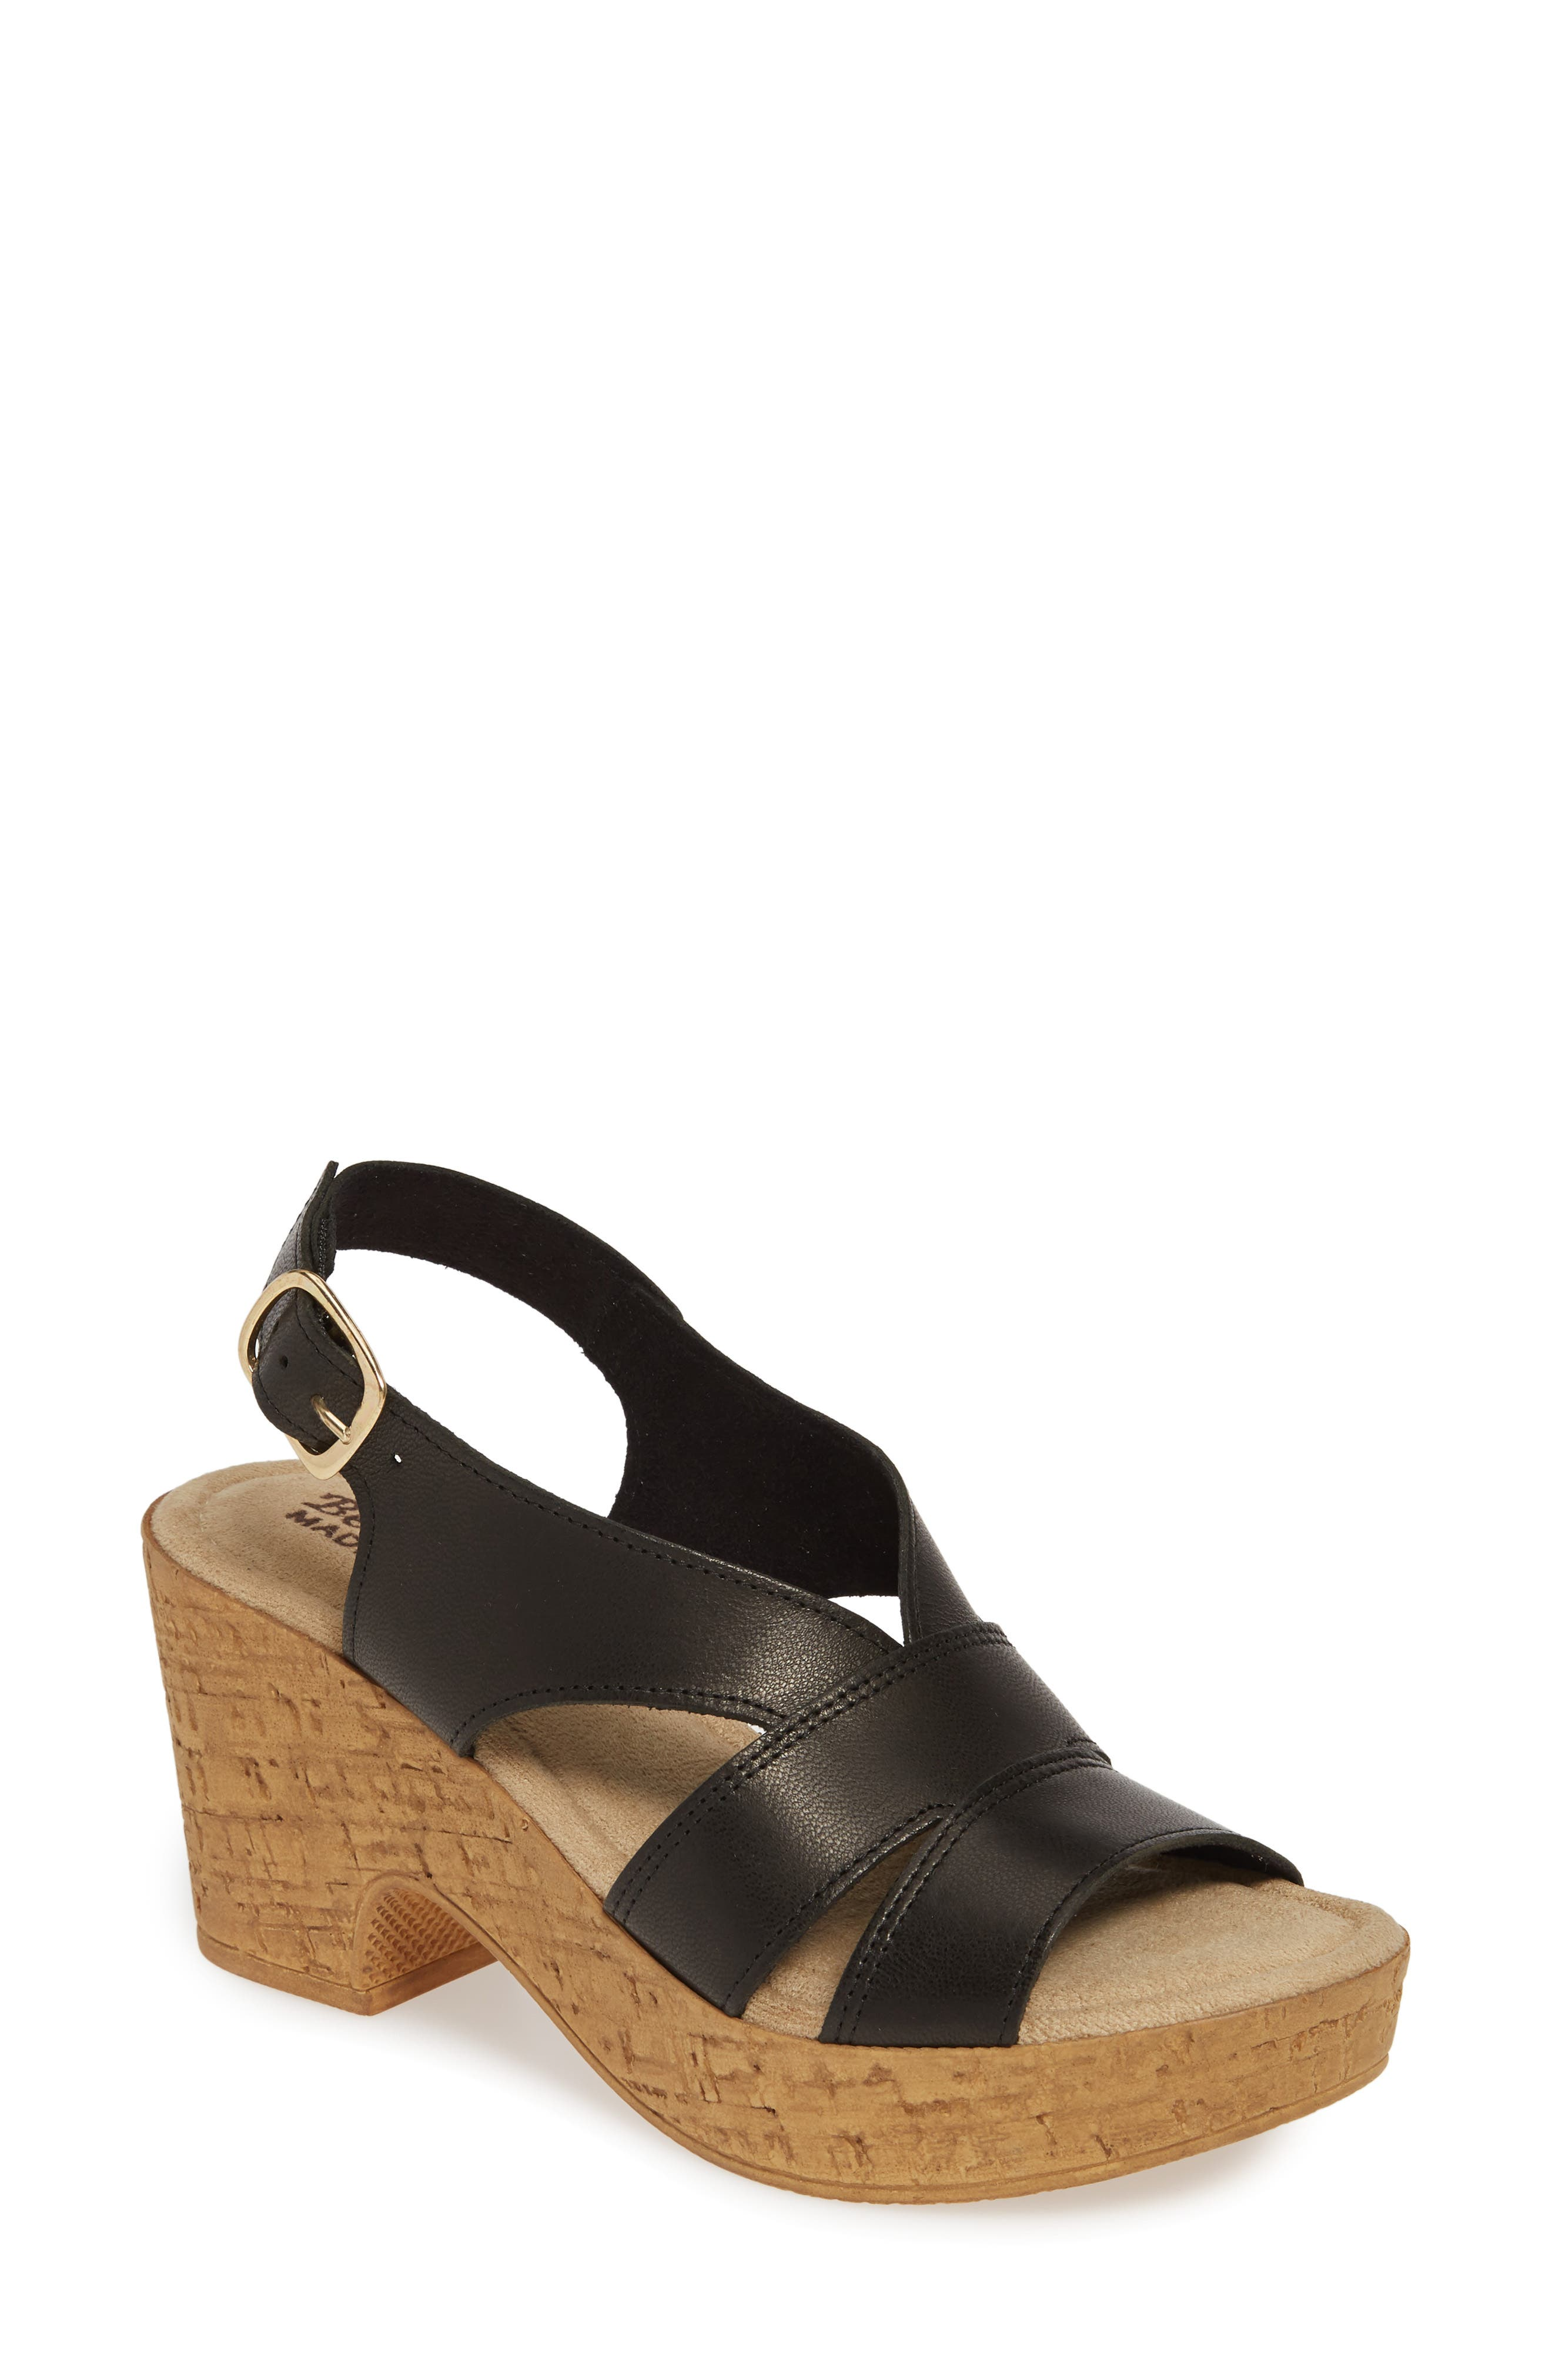 BELLA VITA, Jaz Platform Sandal, Main thumbnail 1, color, BLACK ITALIAN LEATHER